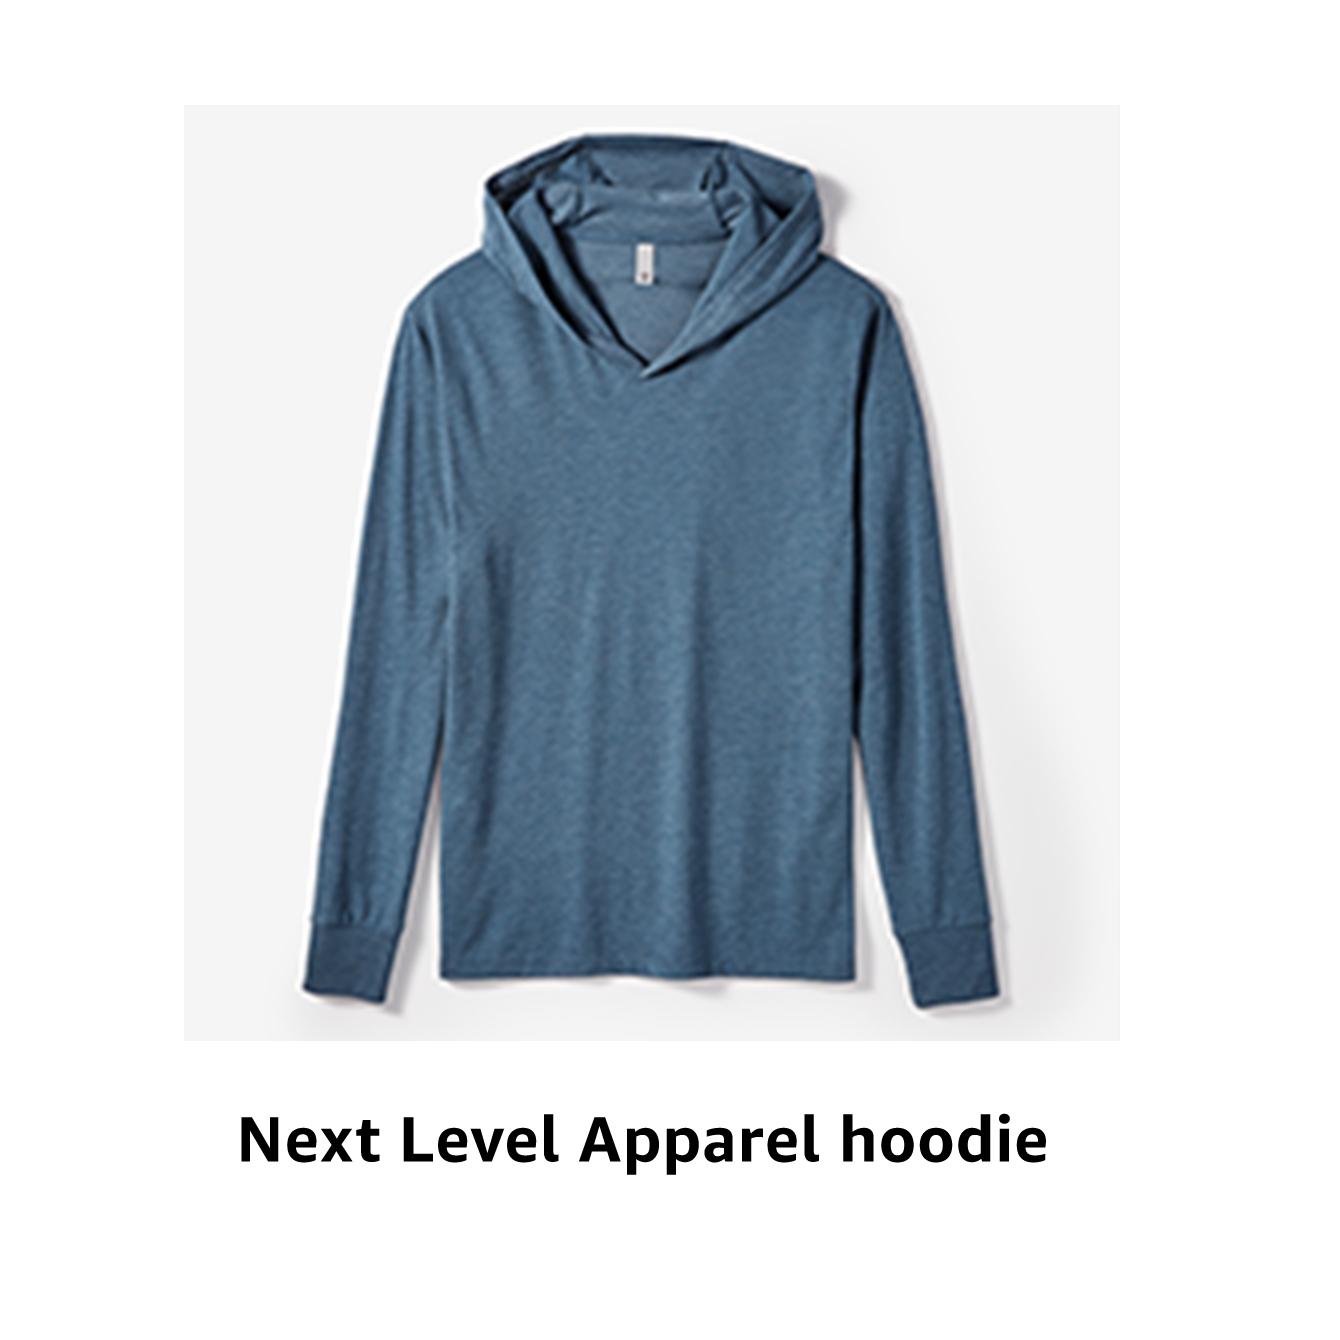 Next Level Apparel hoodie